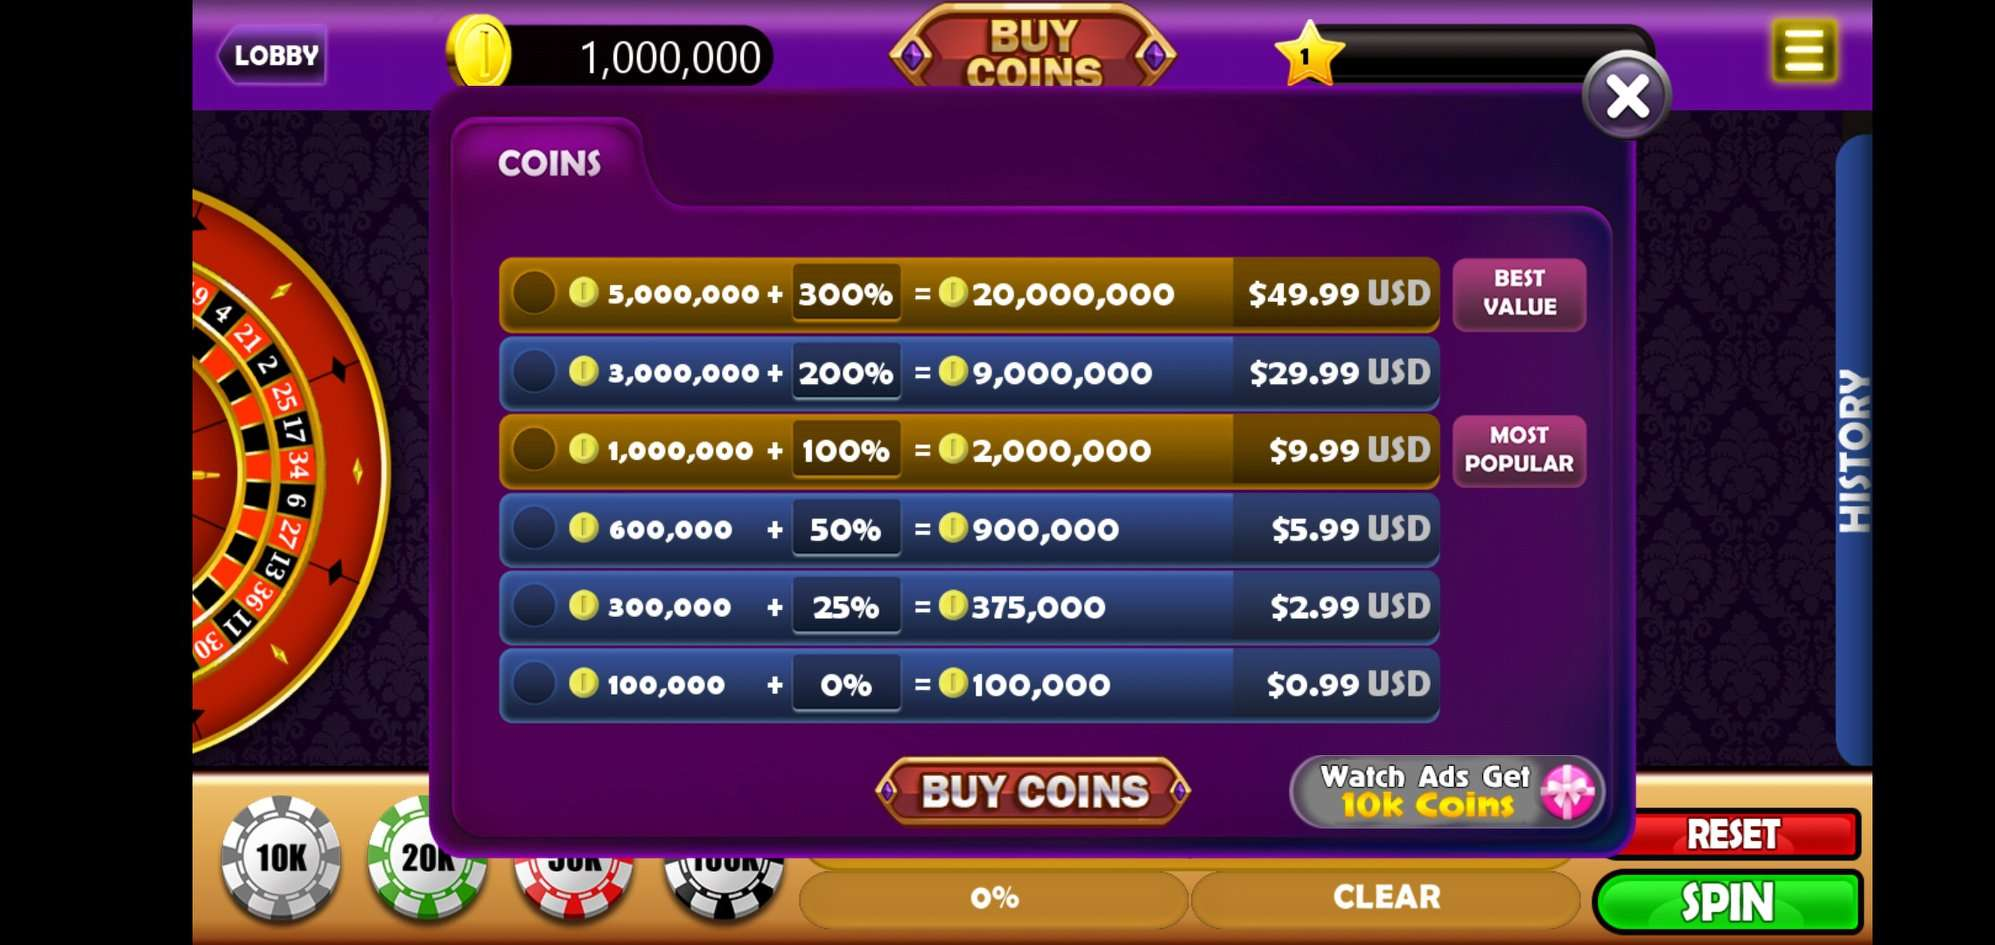 4 in 1 Slots, Roulette, Blackjack, Baccarat